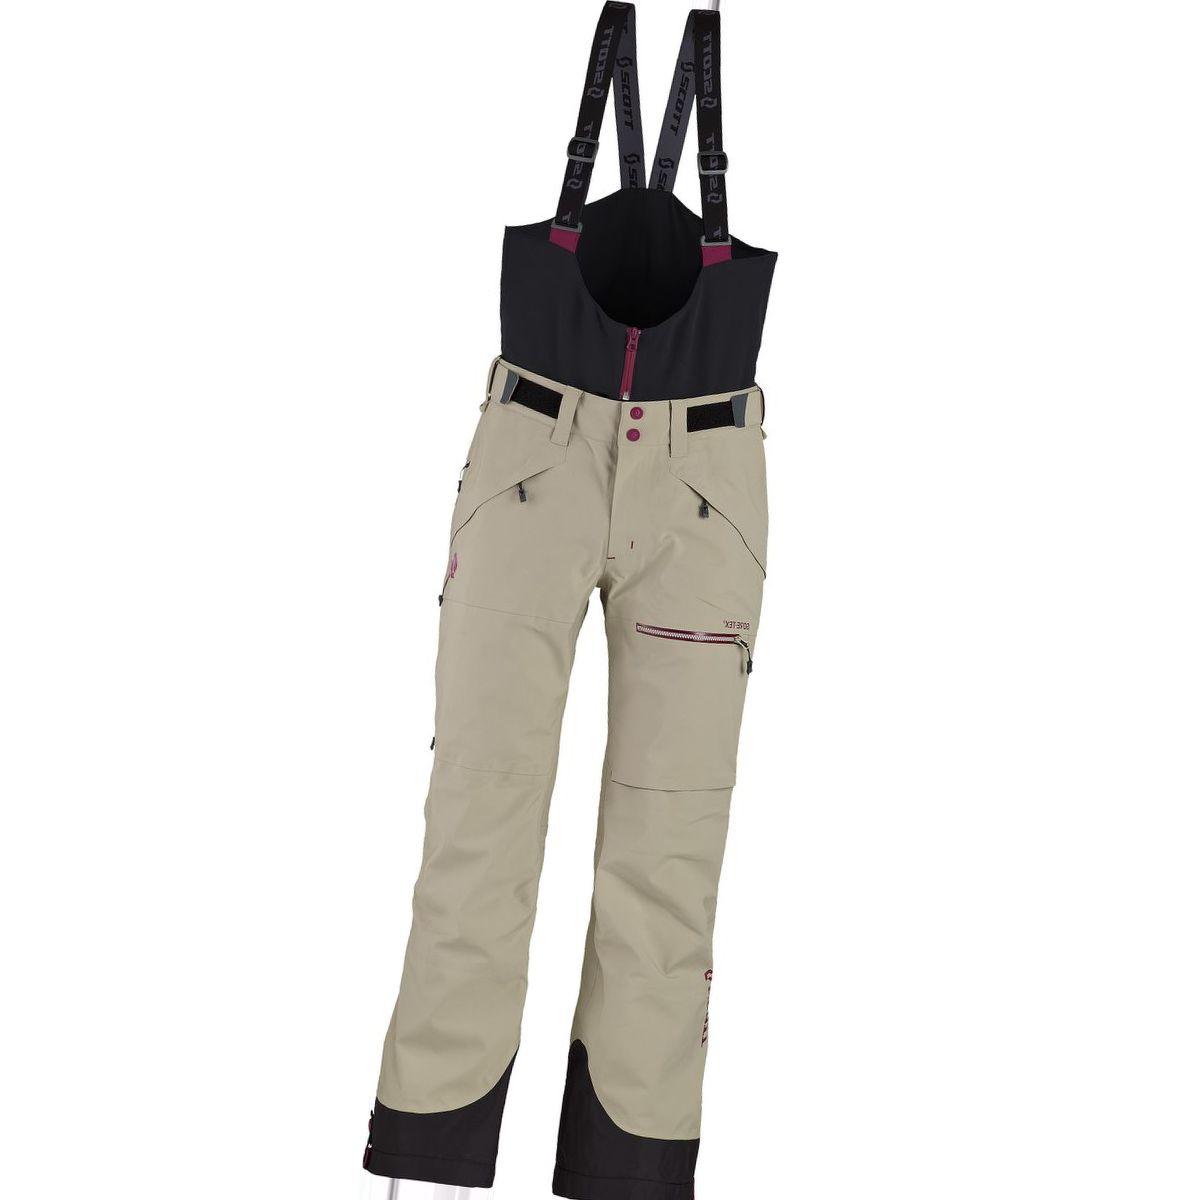 Scott Vertic GTX 3L Pant - Women's